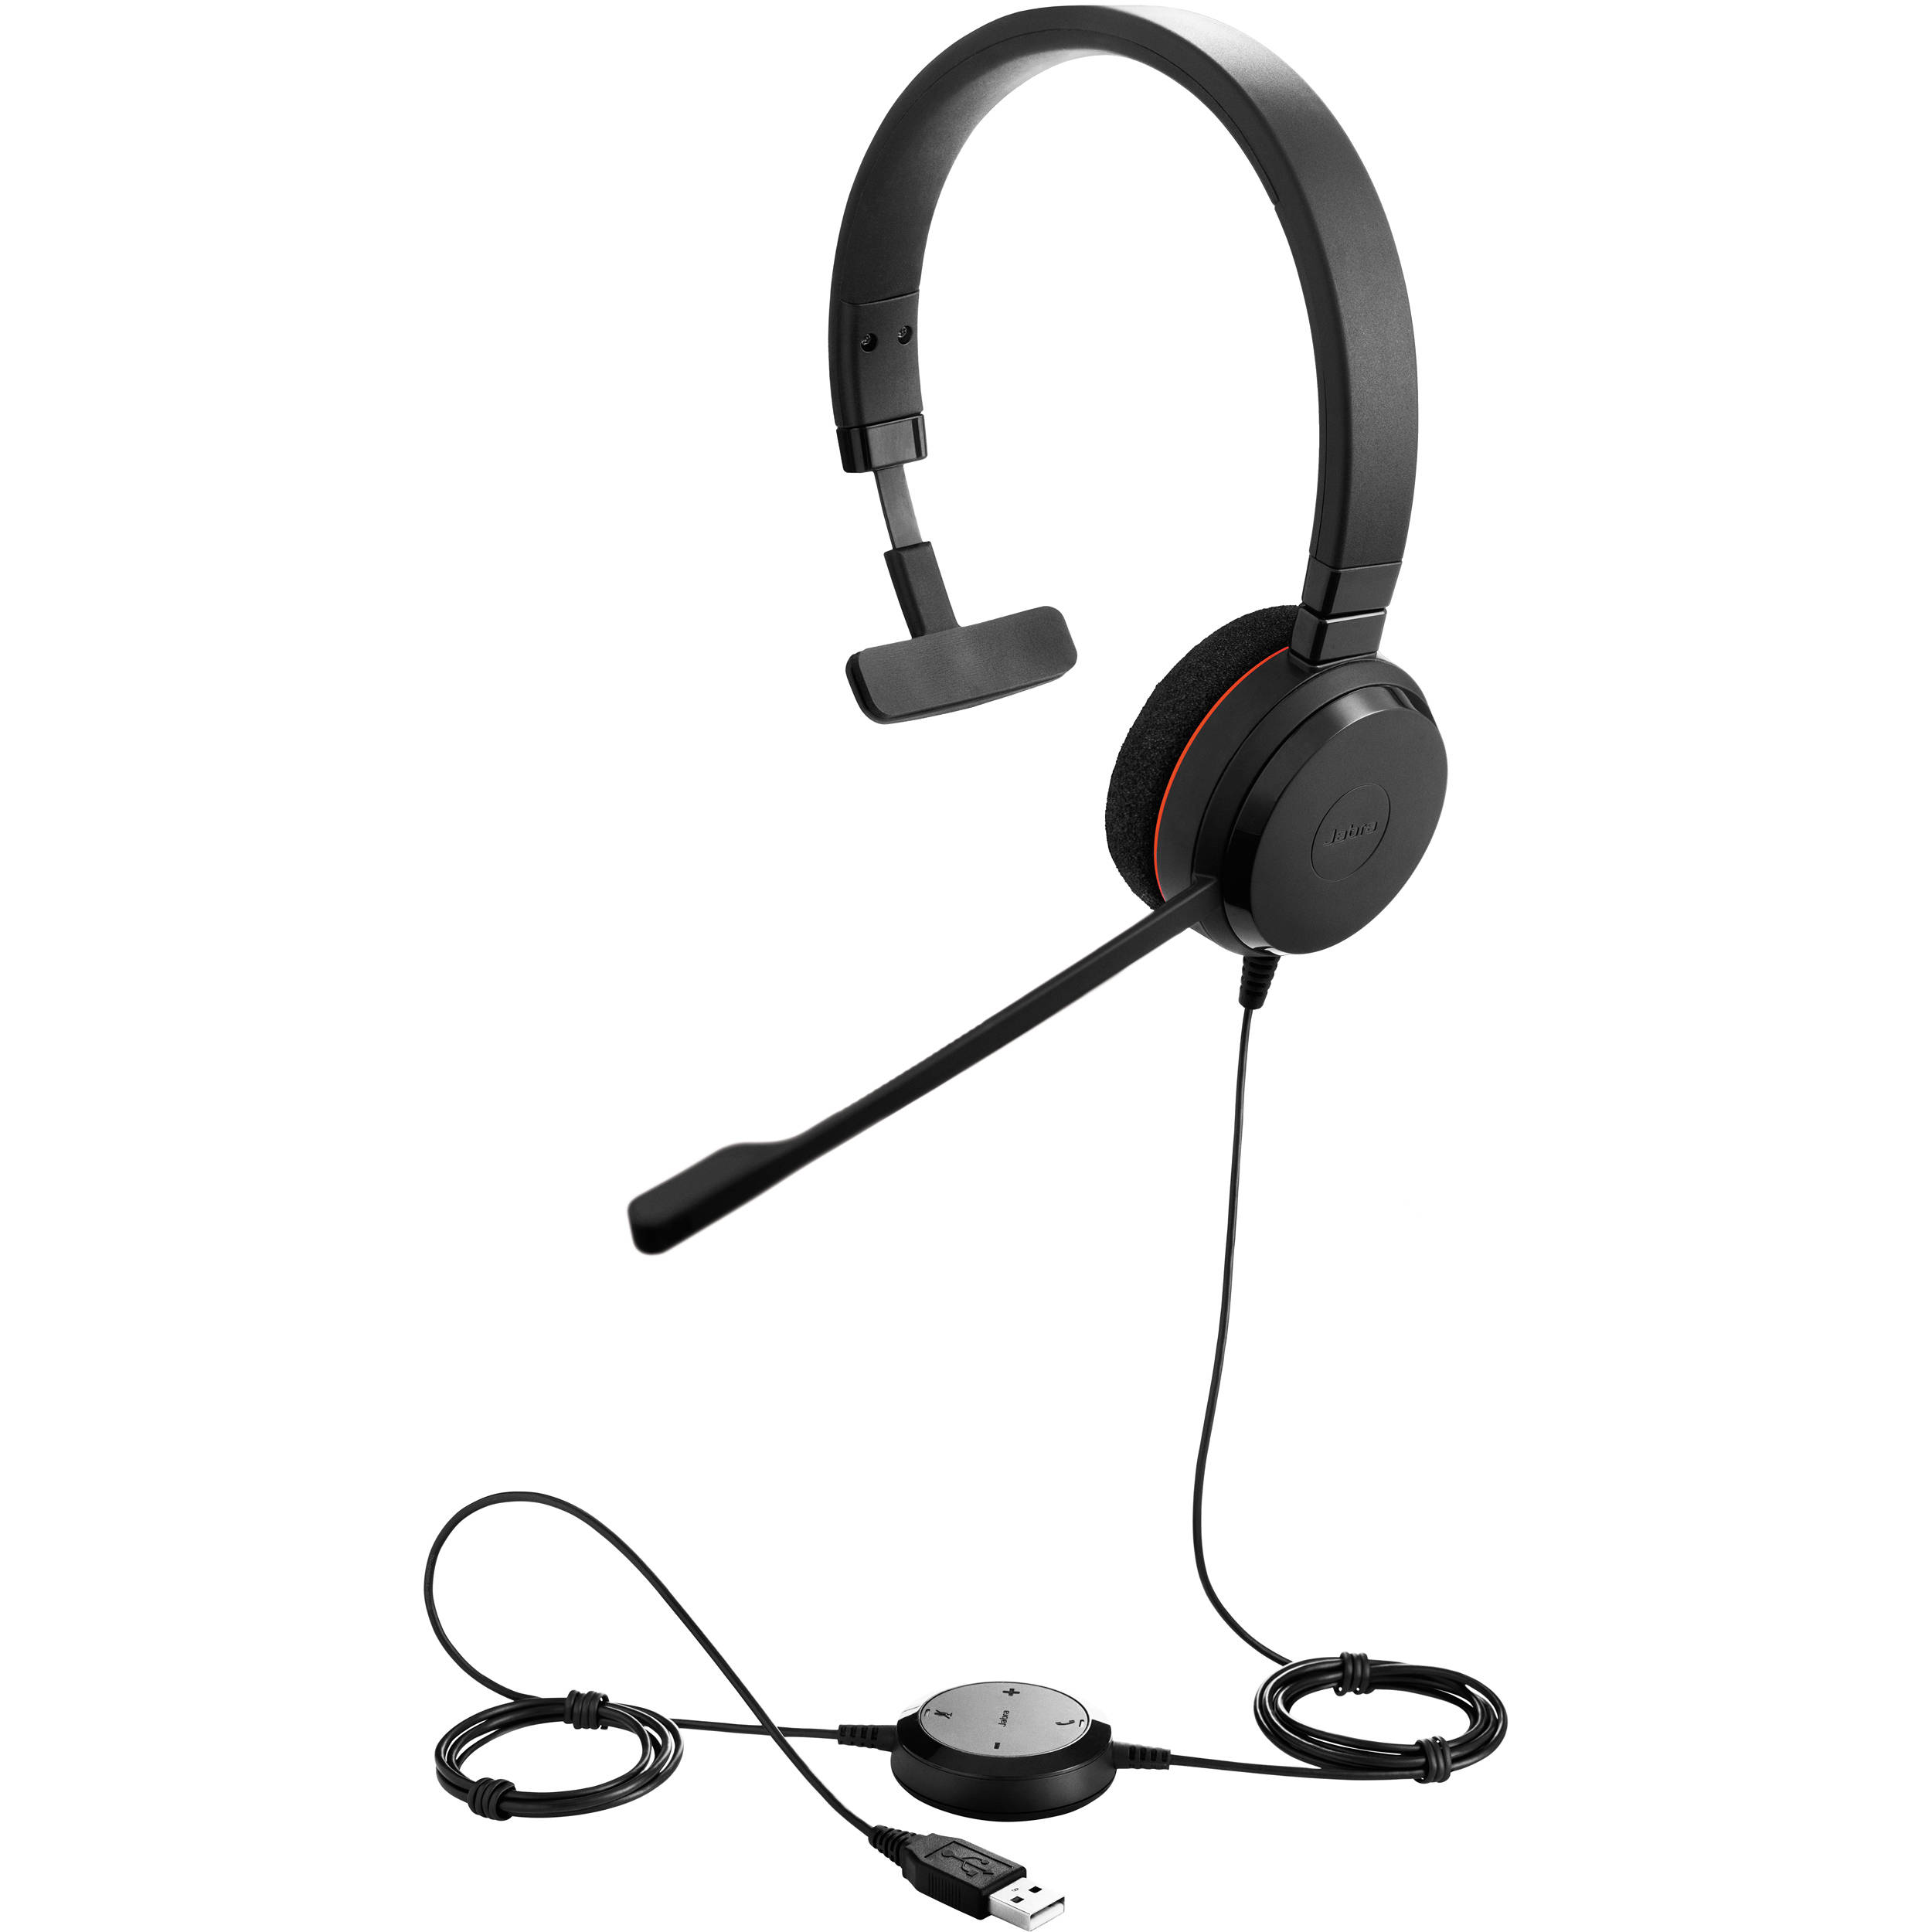 Jabra EVOLVE 20 Microsoft Lync Mono Headset 4993-823-109 B\u0026H